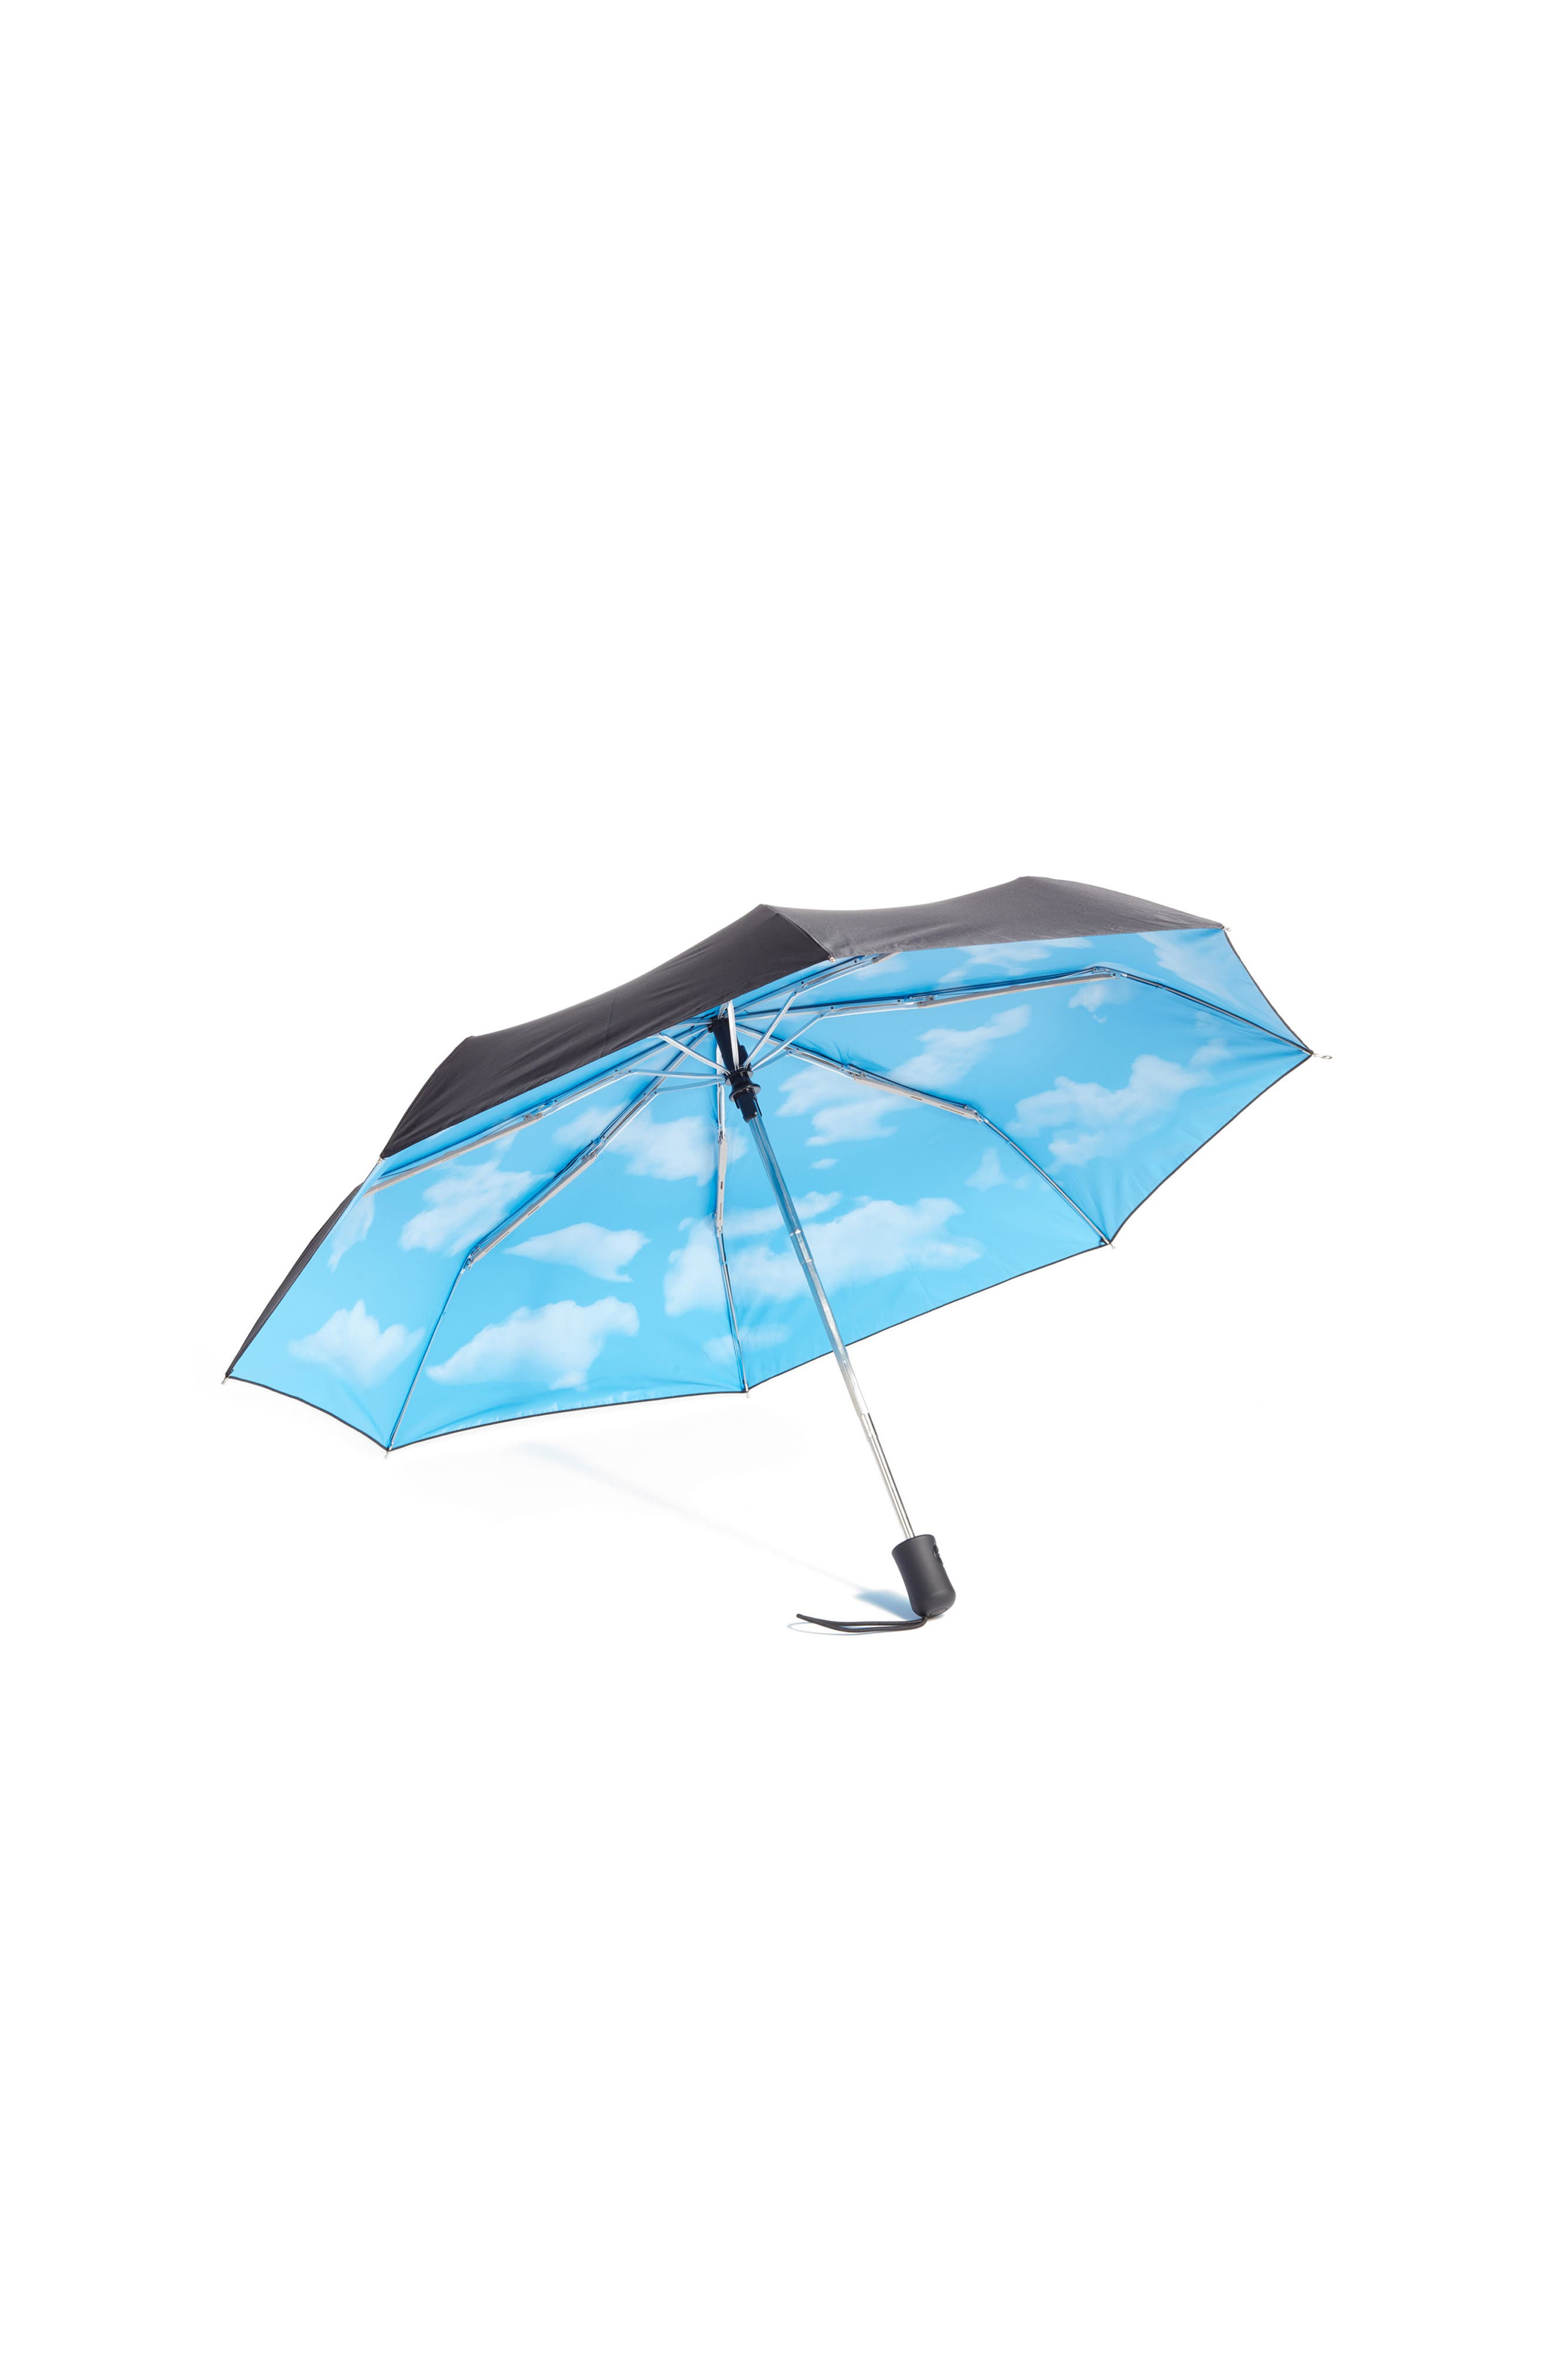 MoMA Design Store Collapsible Sky Umbrella